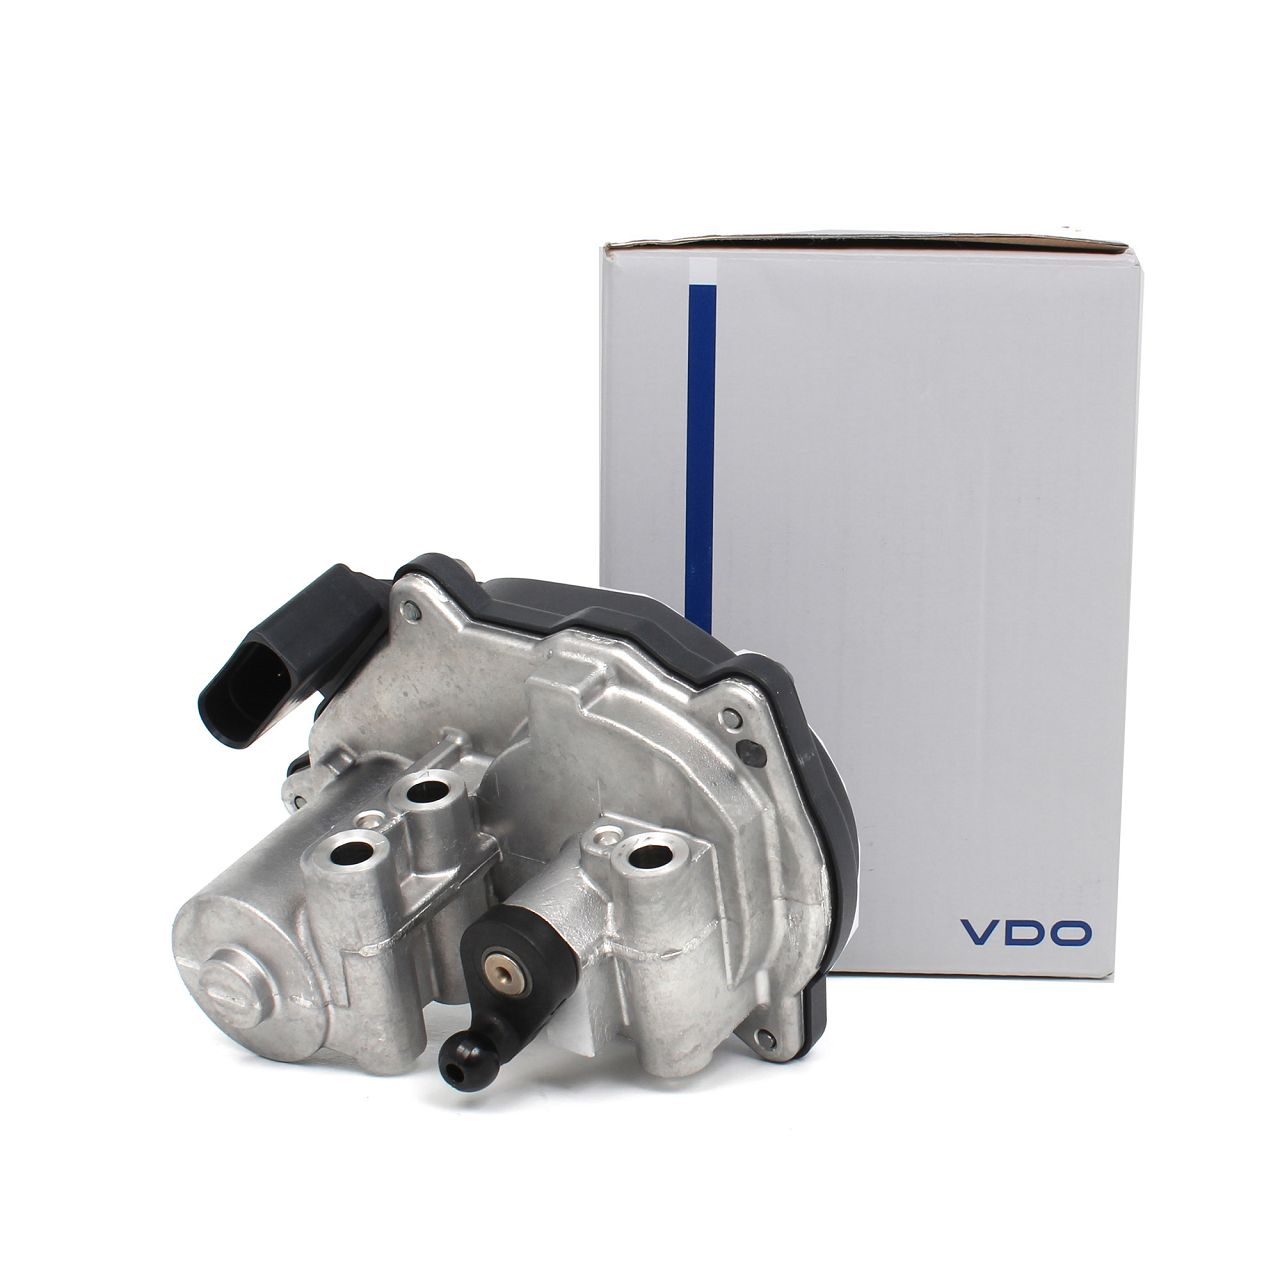 VDO Luftklappensteller Stellmotor Drallklappen Ansaugbrücke für AUDI 2.7/3.0 TDI